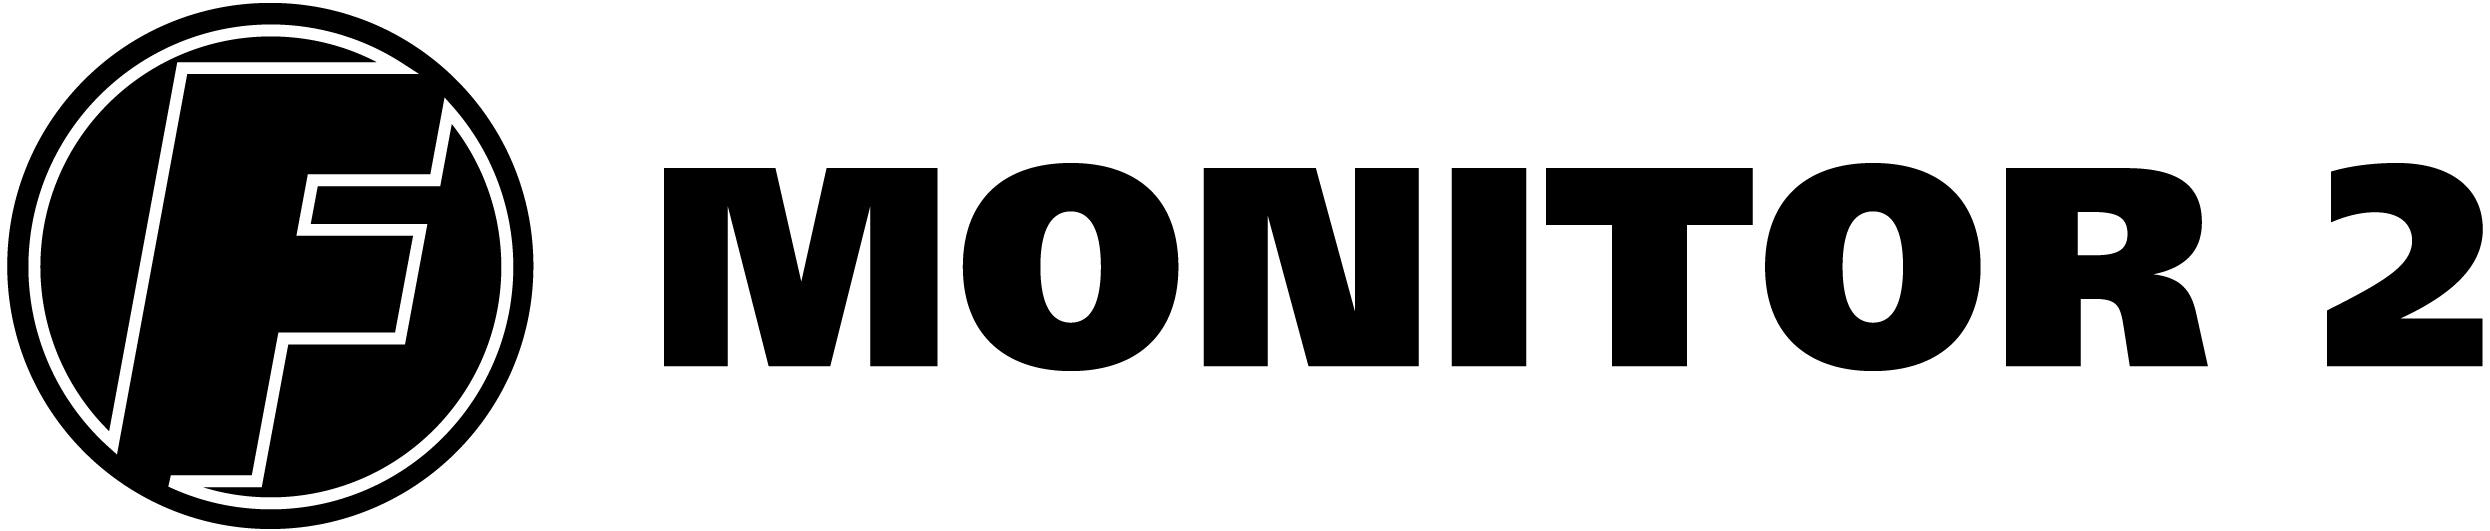 F Monitor 2 Logo